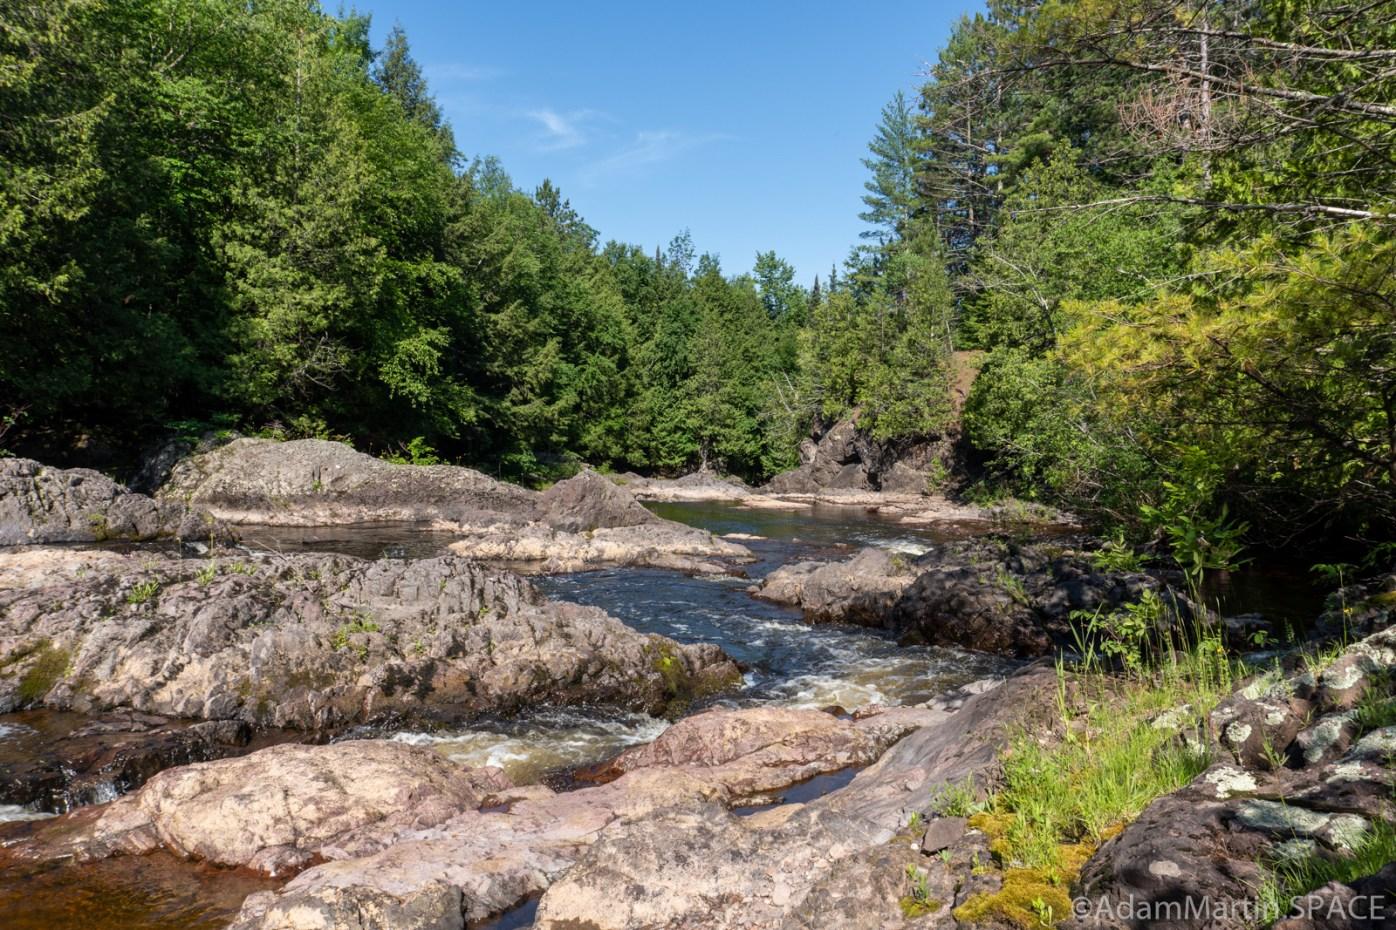 Potato River Dalles - Downstream views